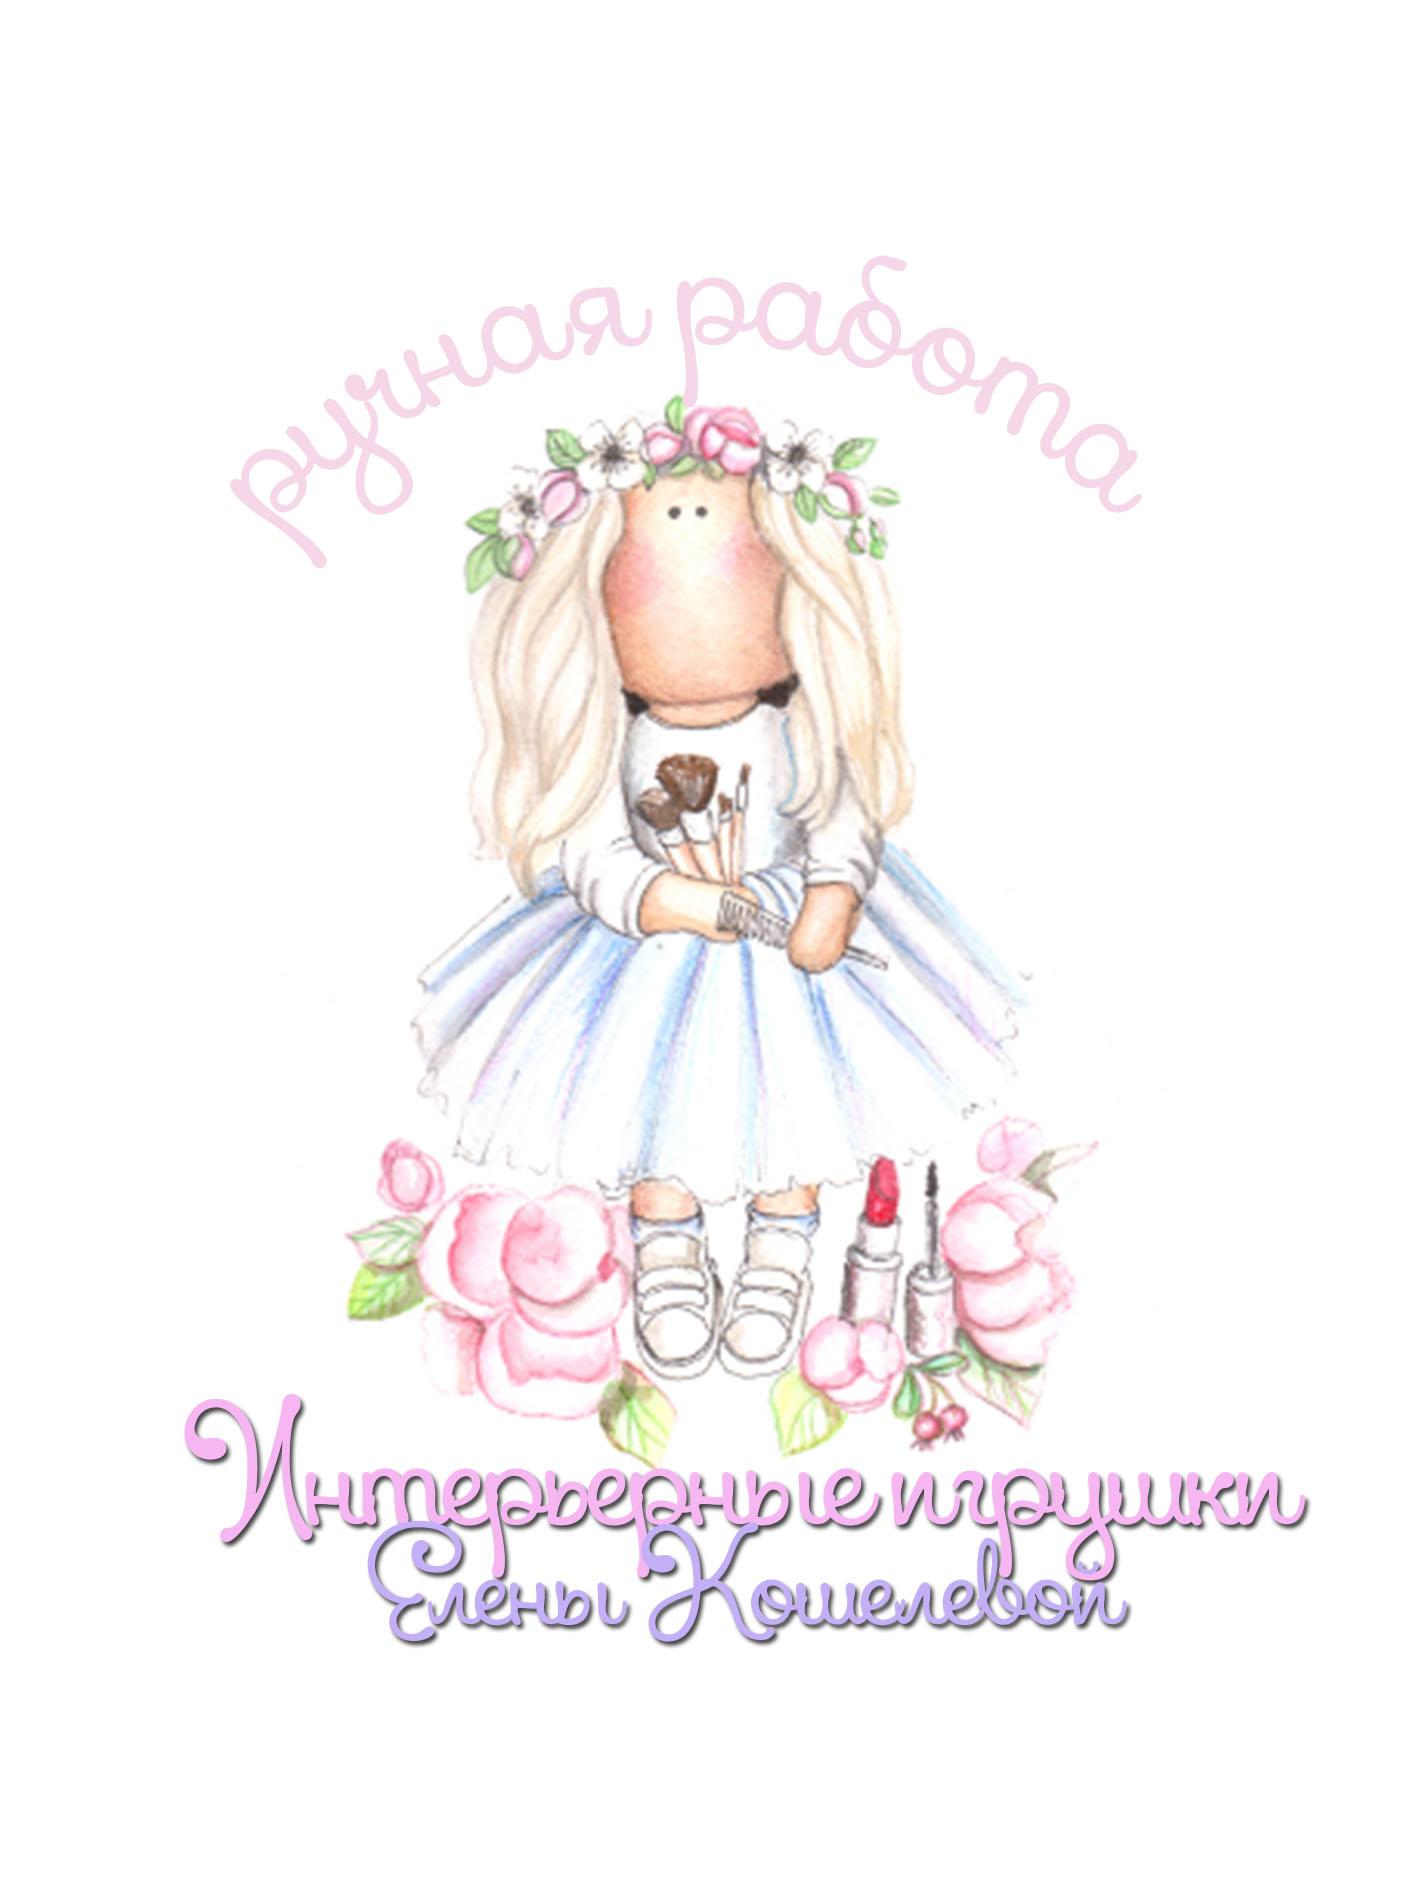 lenok140562@yandex.ru